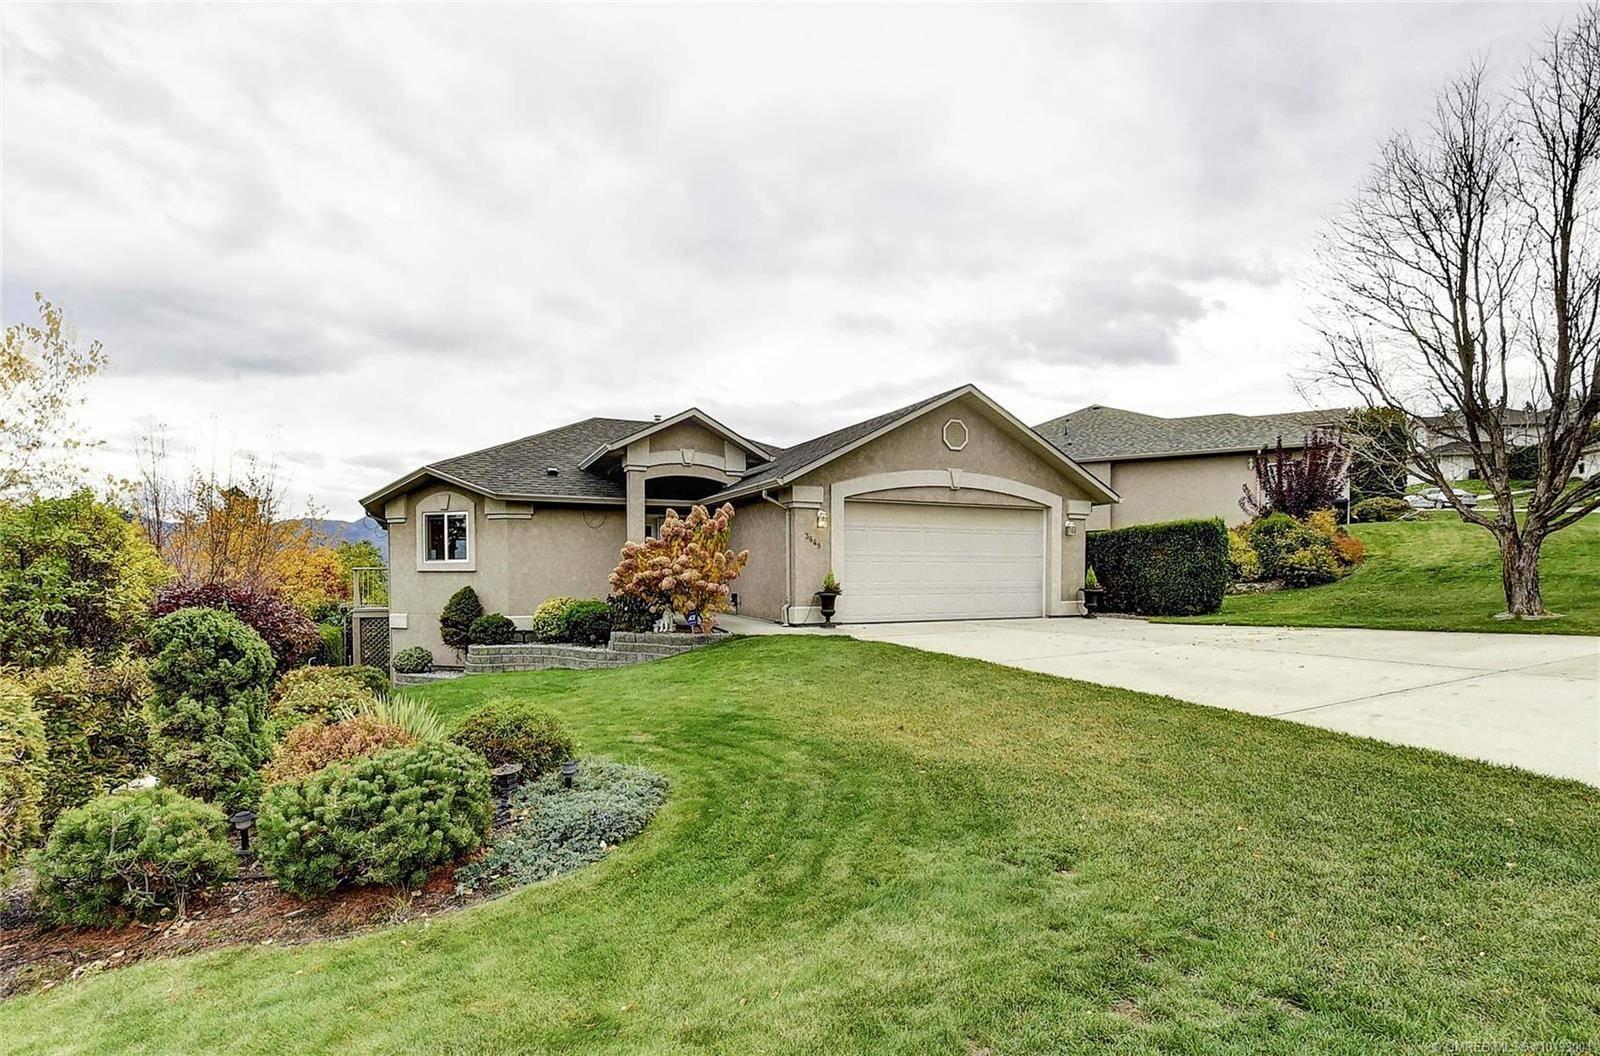 House for sale at 3649 Walnut Glen Dr West Kelowna British Columbia - MLS: 10193004